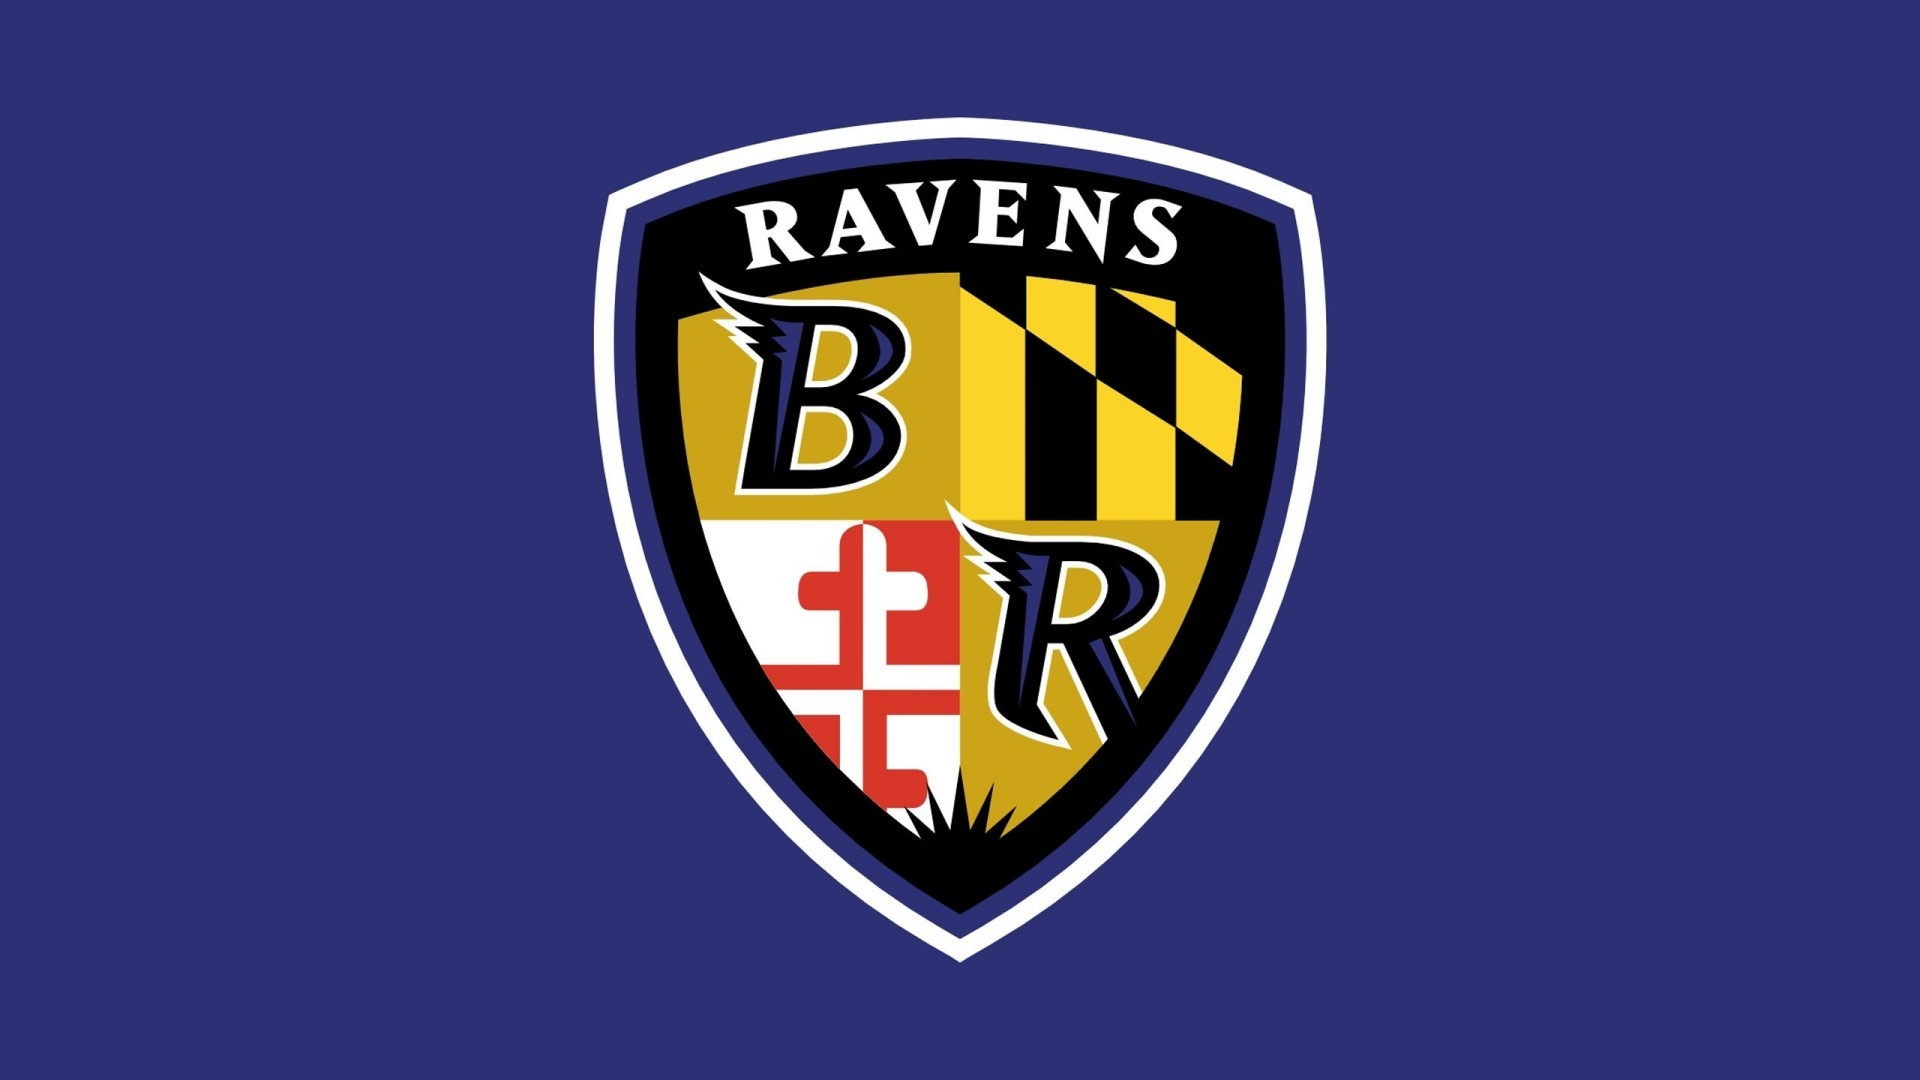 1920x1080 Baltimore Ravens HD k Schedule Wallpaper Baltimore Ravens Wallpaper Wallpapers)